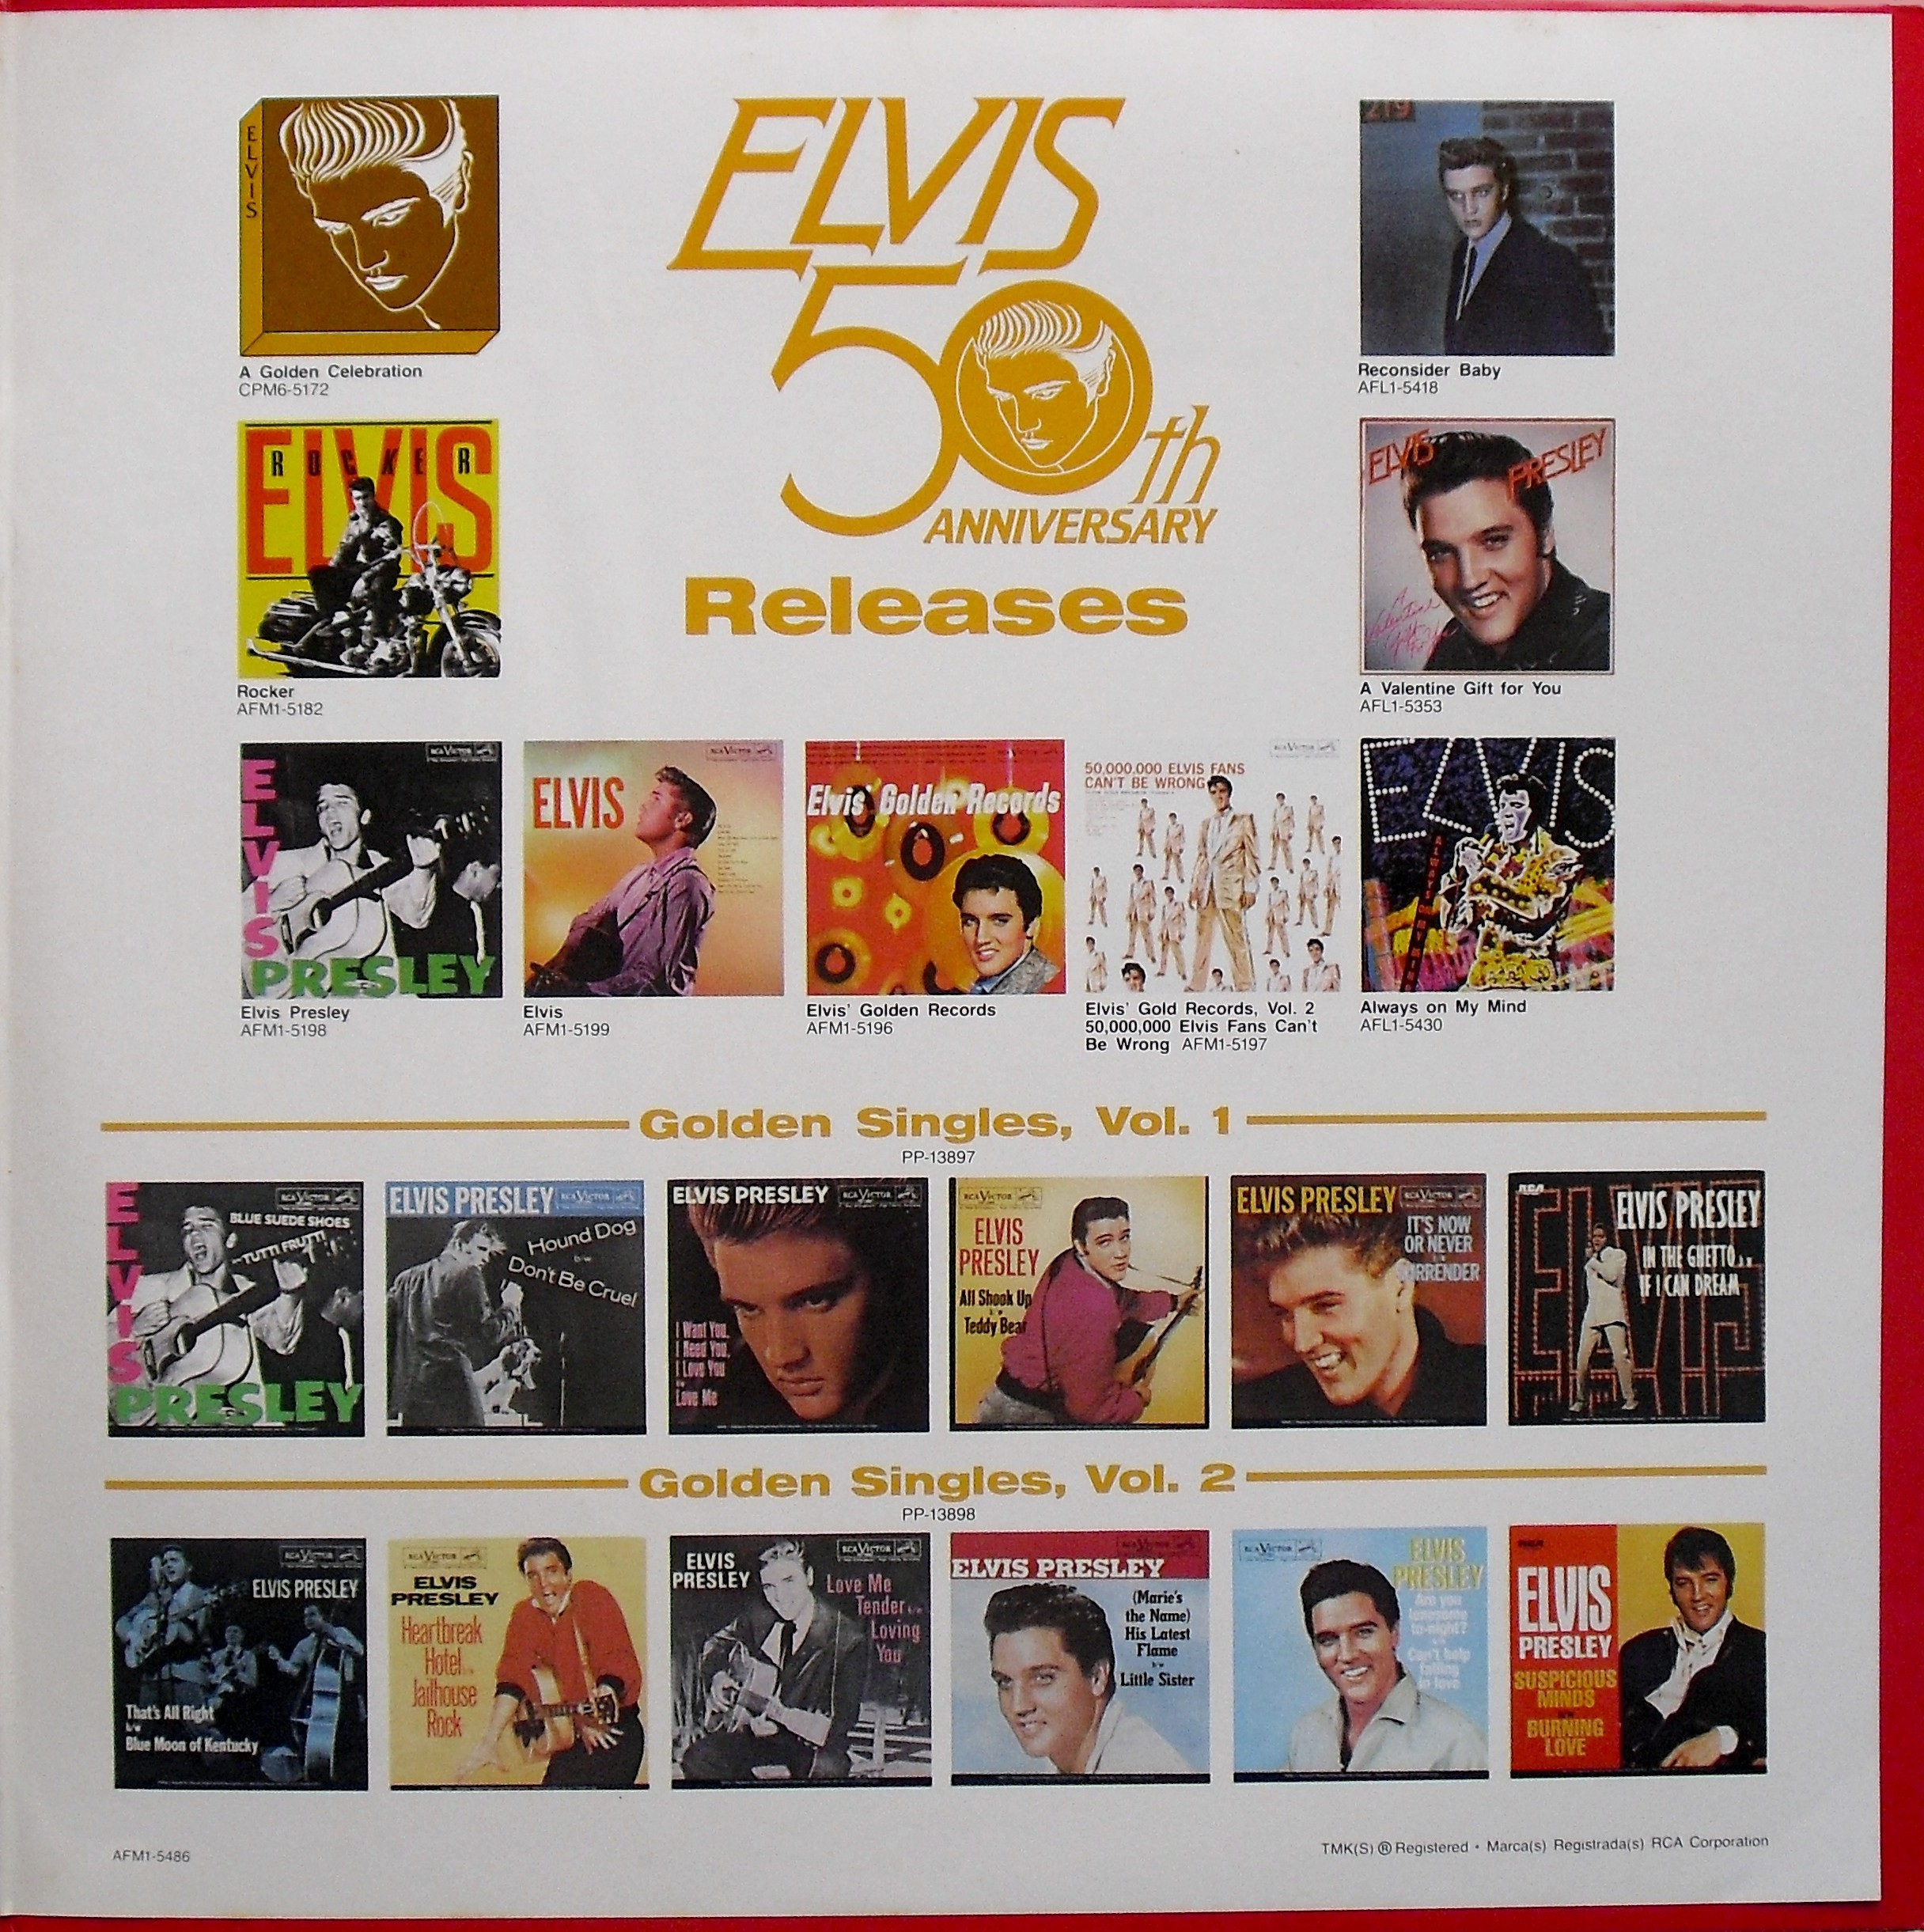 ELVIS' CHRISTMAS ALBUM 0159fmh